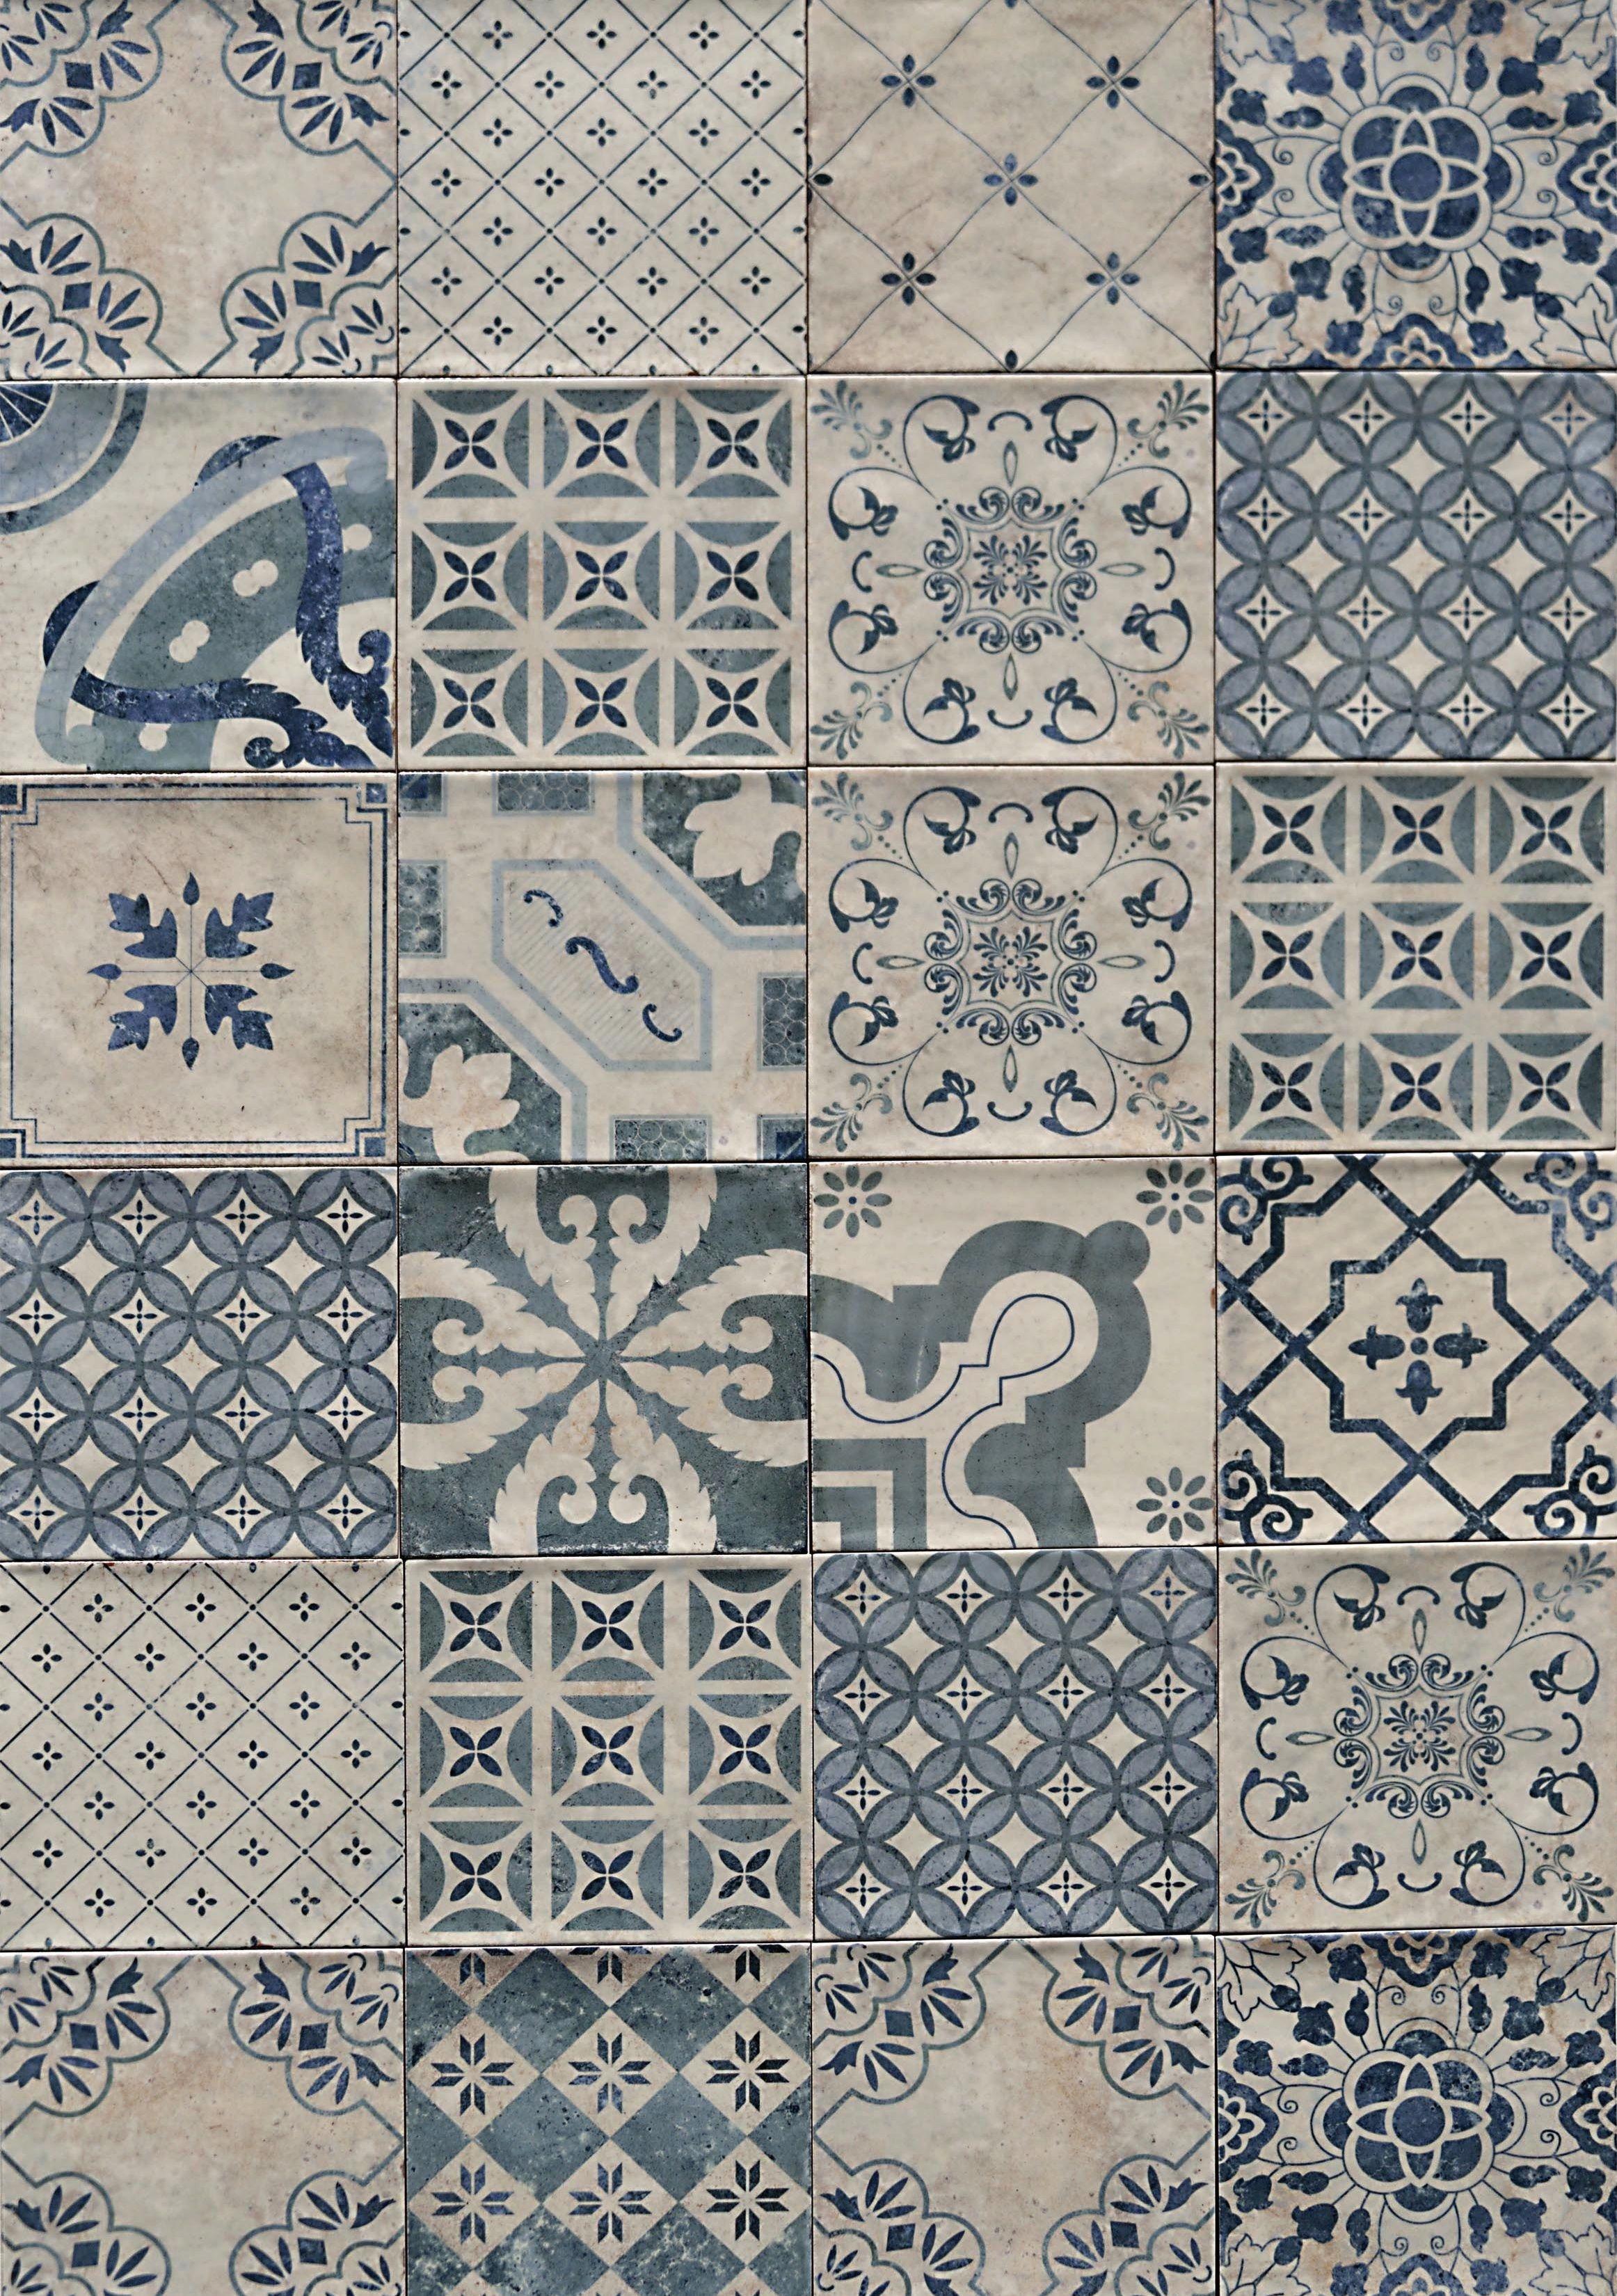 Wandtegels Keuken Blauw : share wandtegels dekor antiqua glanzende wandtegels mix per m2